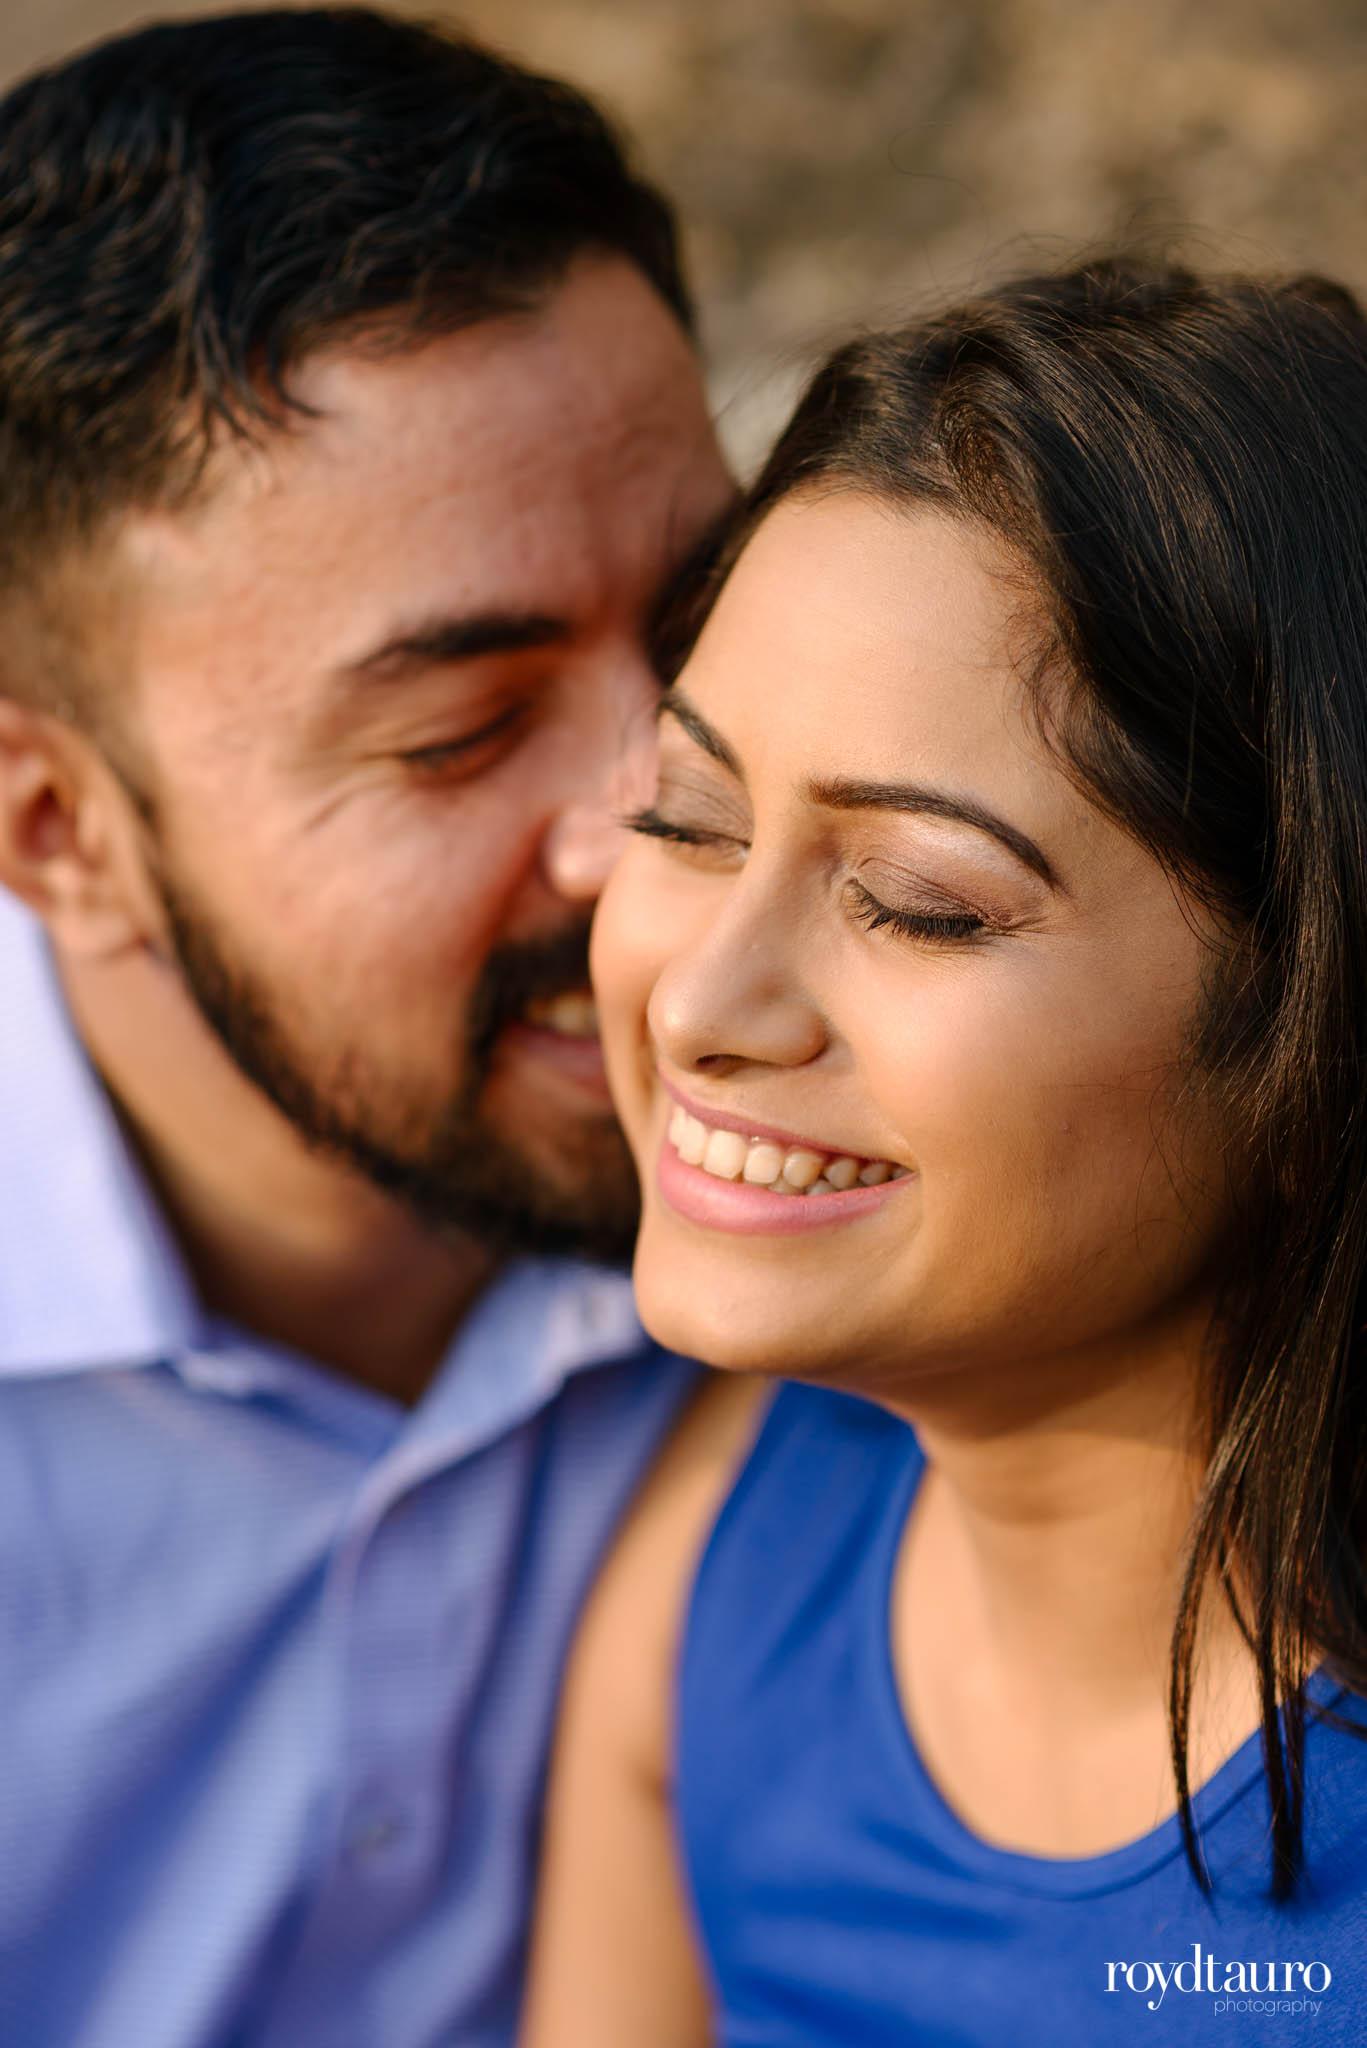 Kim-Rahul-Prewedding-11.jpg